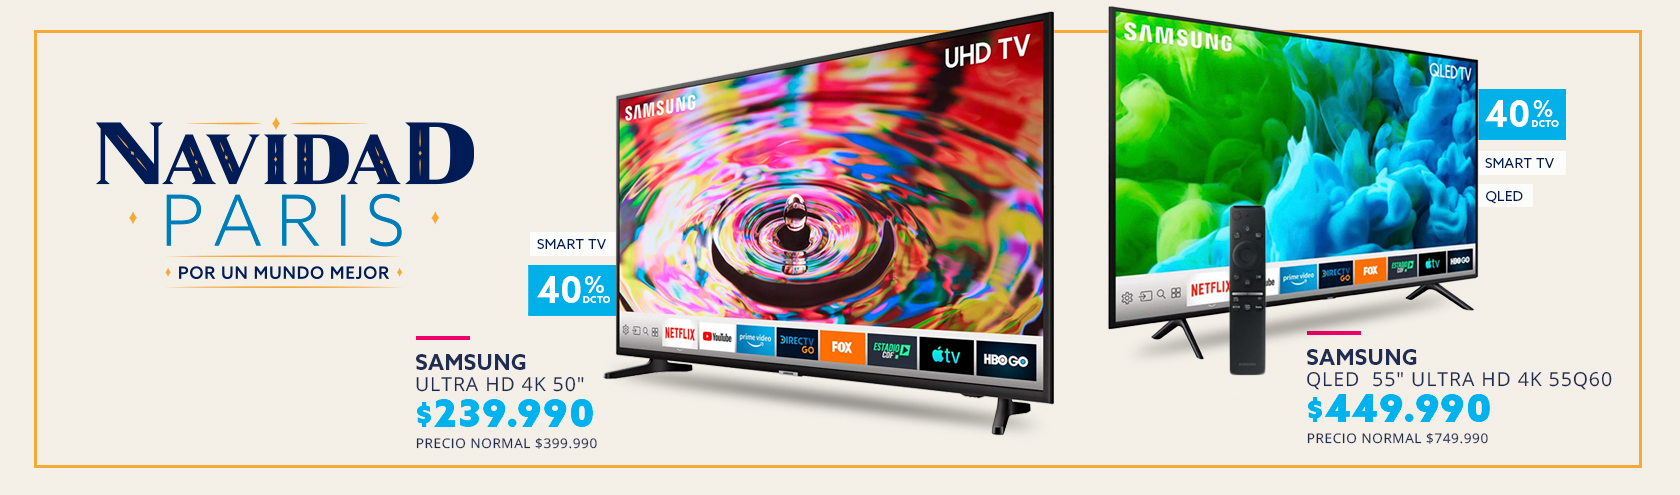 QLED Smart TV 55 Ultra HD 4K 55Q60